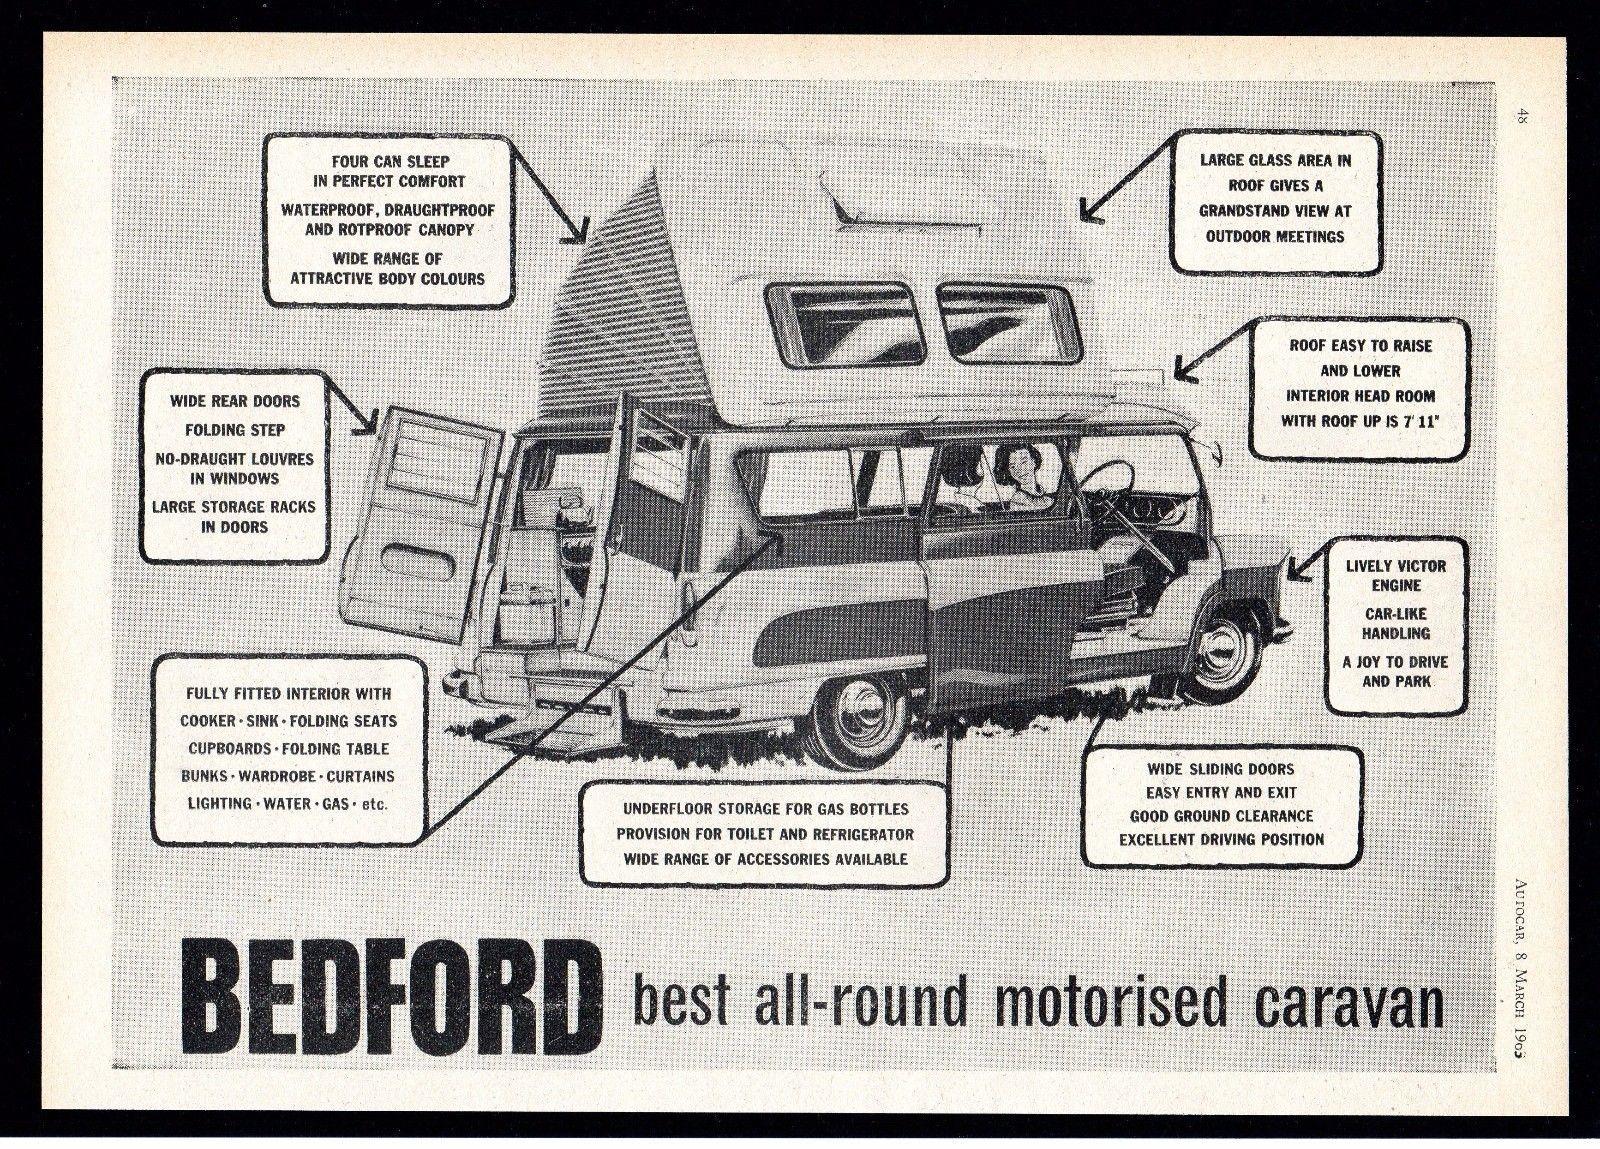 1963 bedford romany motor caravan motor home martin walter ltd.magazine advert  sc 1 st  Pinterest & 1963 bedford romany motor caravan motor home martin walter ltd ...